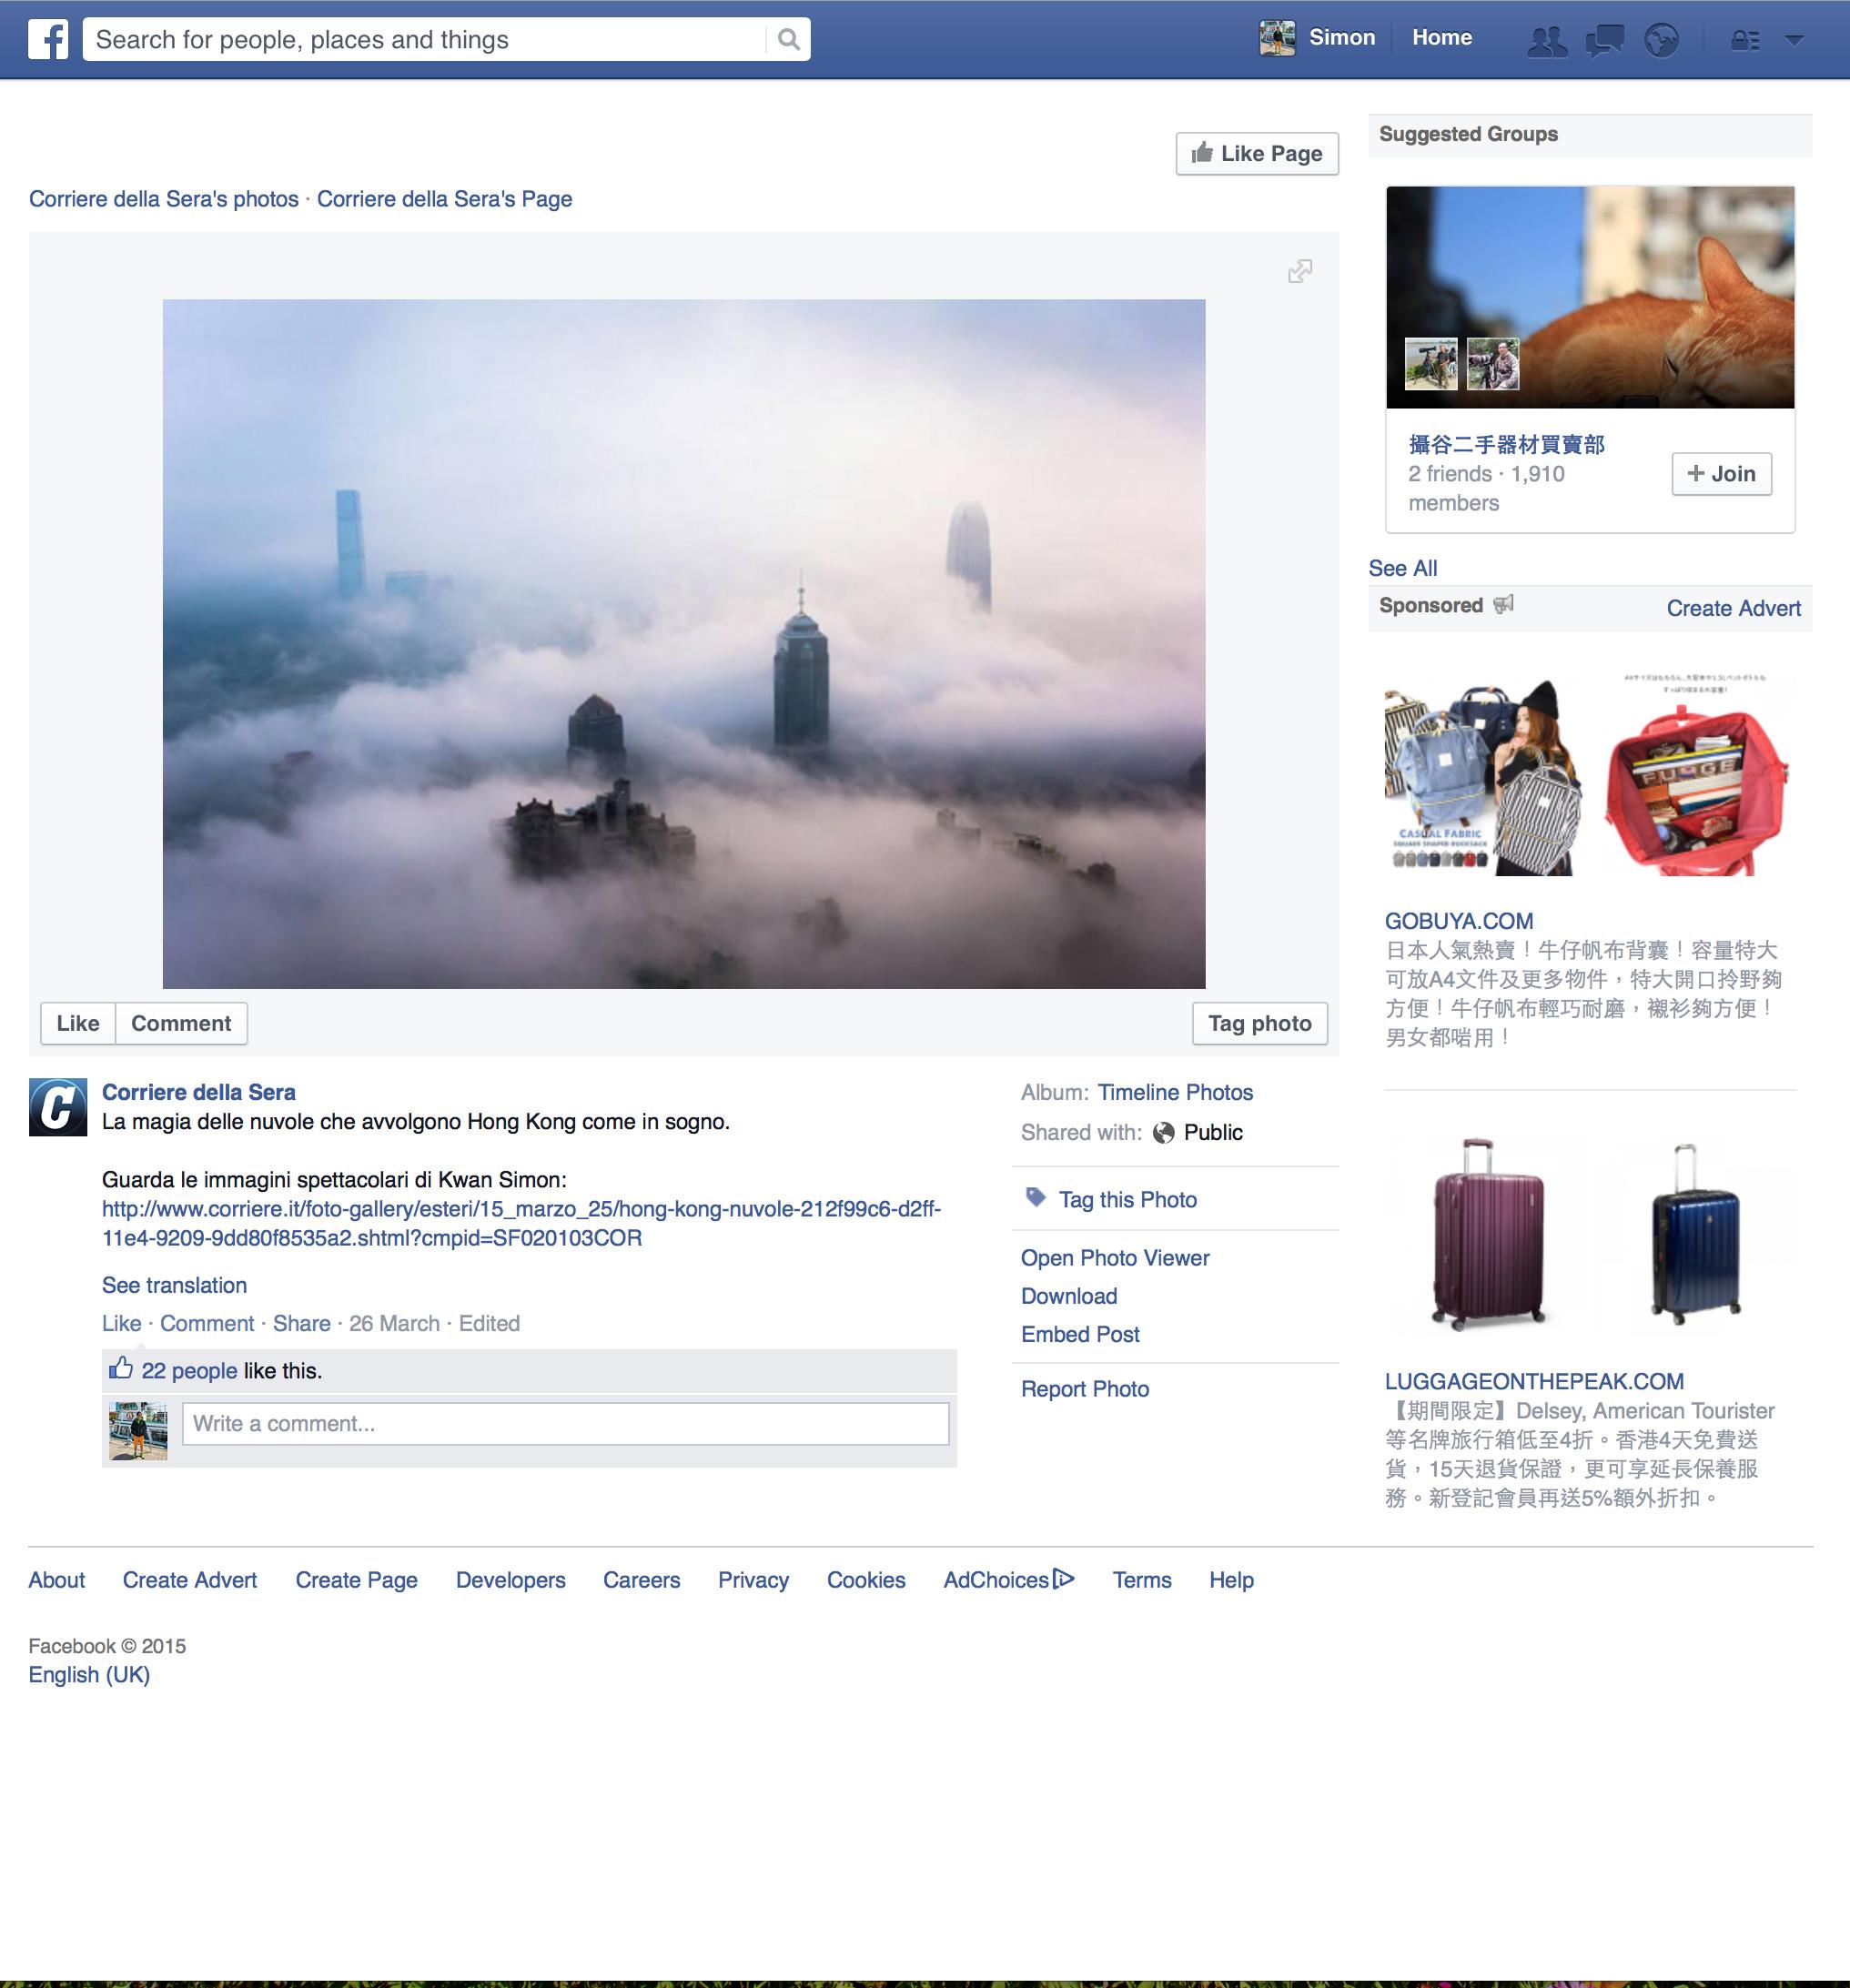 Corriere della Sera   Italian newspaper published in Milan  26.3.2015  Facebook Page - Corriere della Sera  https://www.facebook.com/corrieredellasera/photos/a.284654007529.141319.284515247529/10152983267862530/